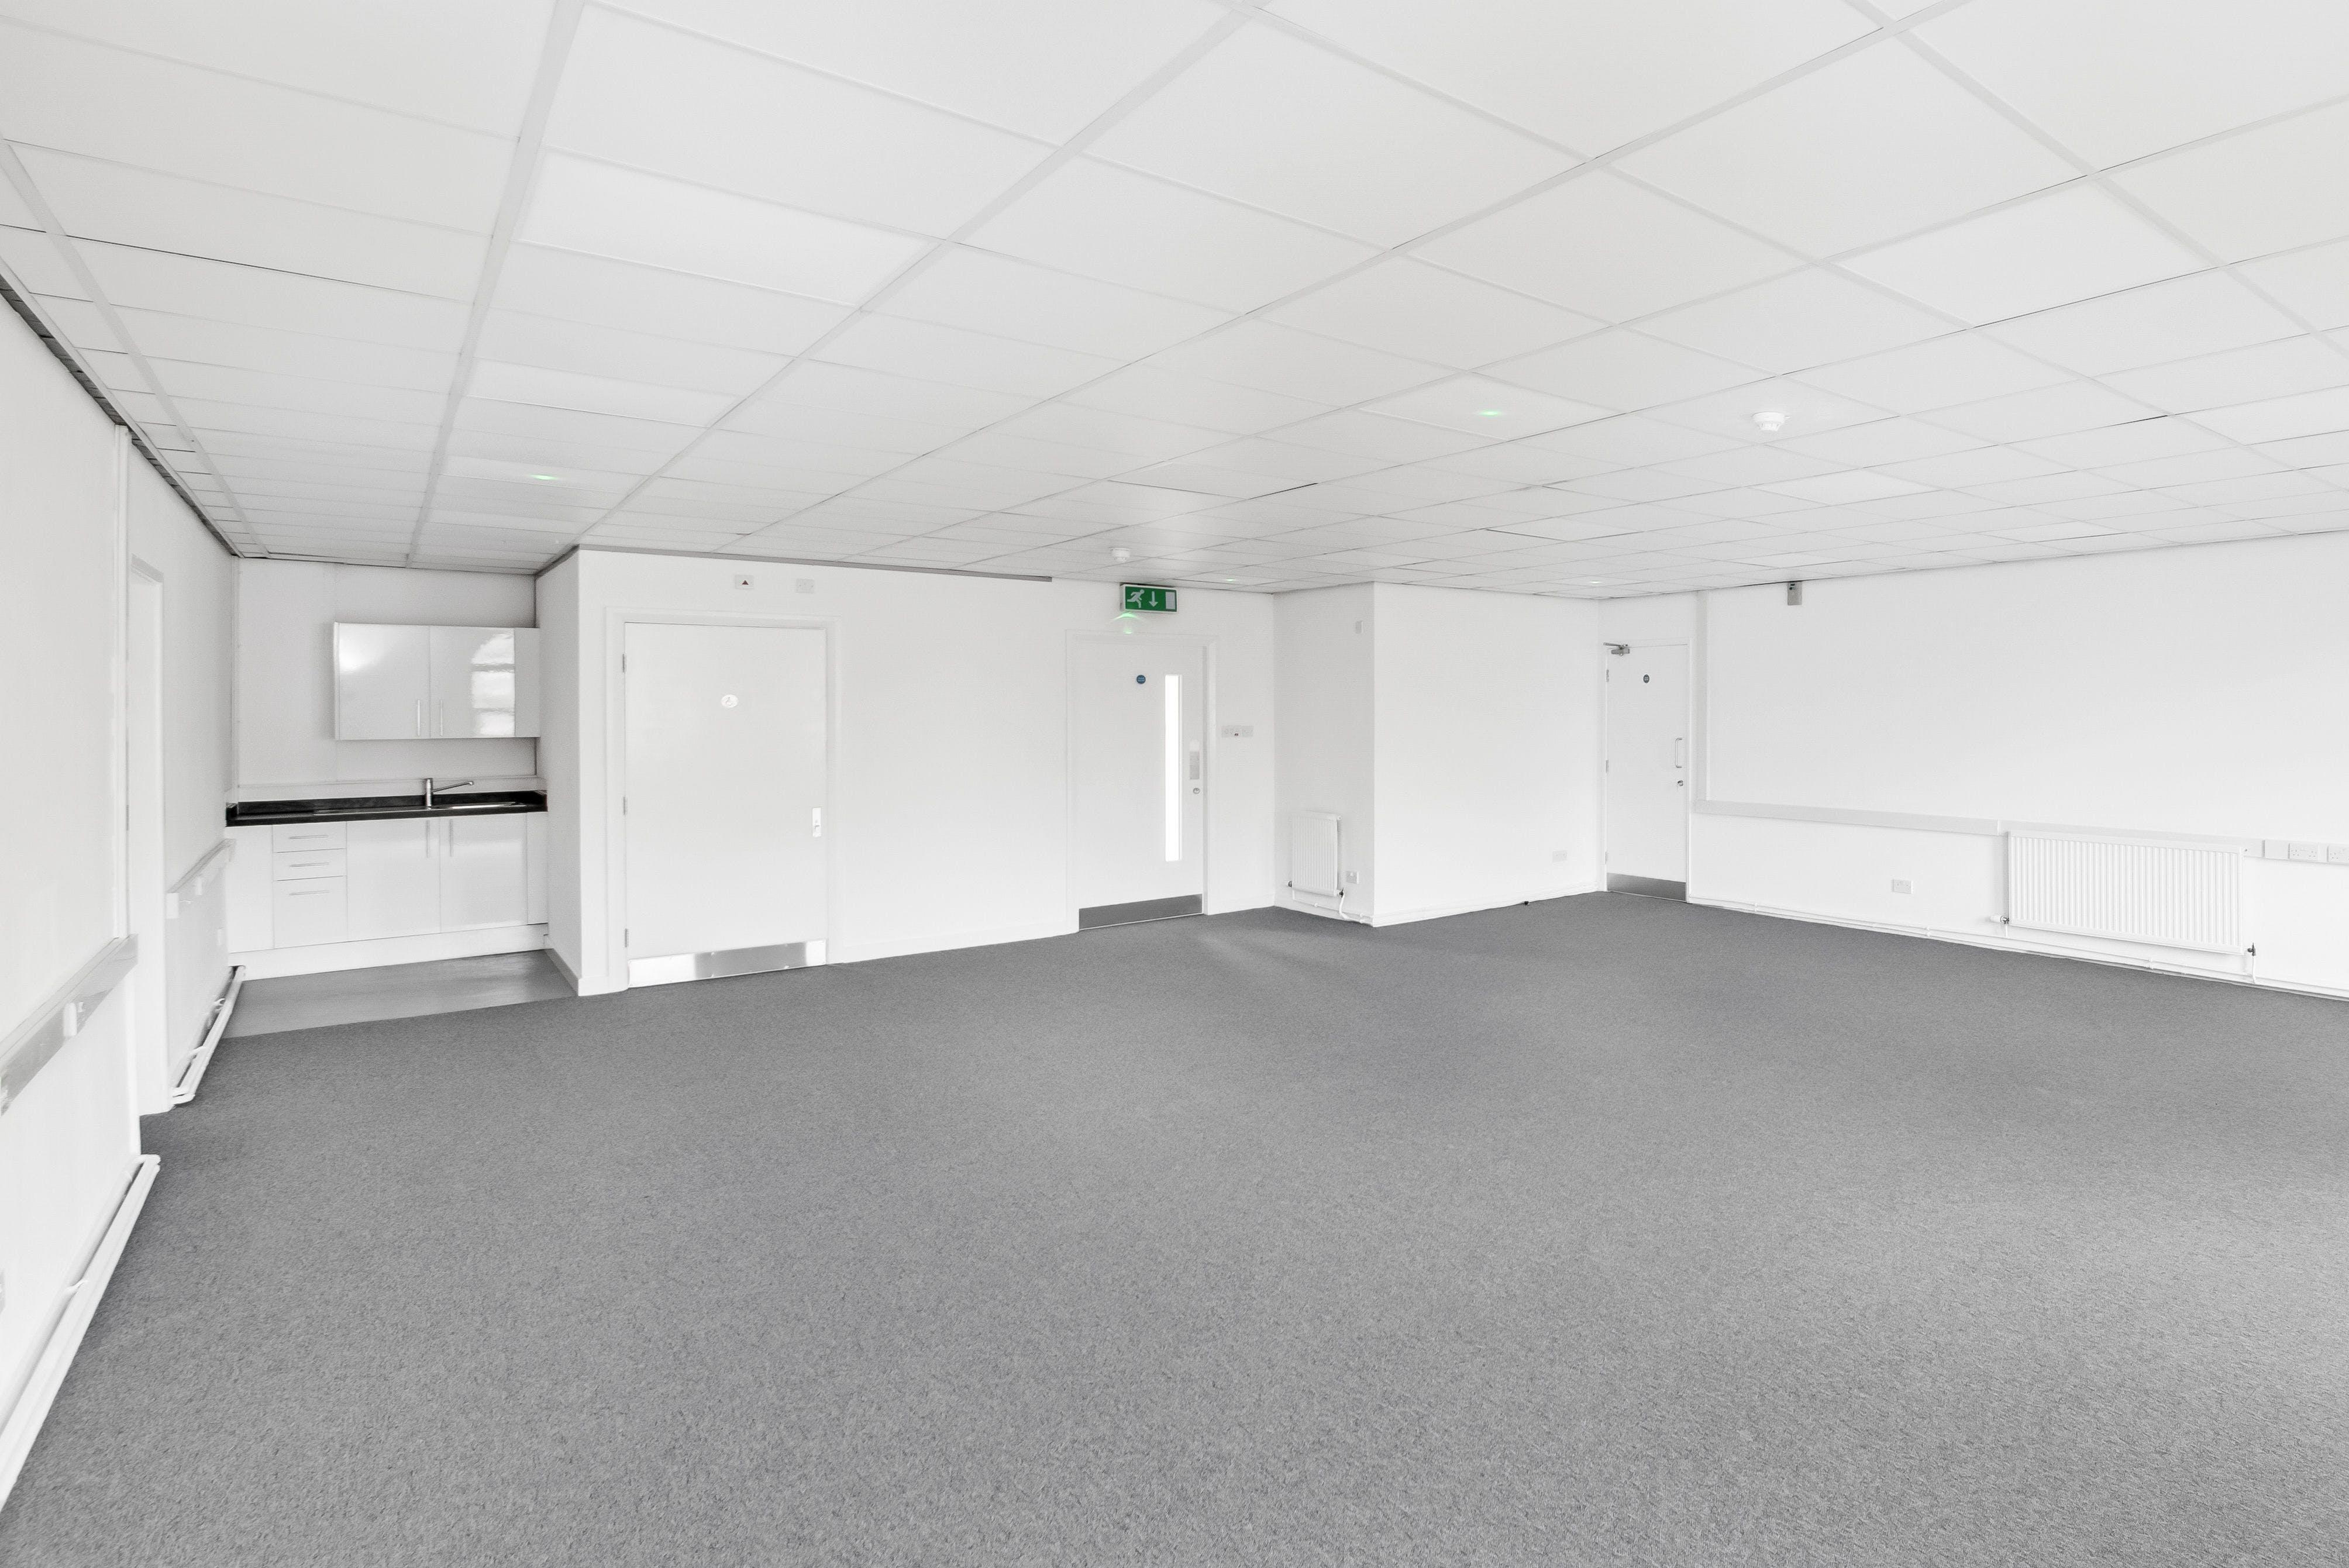 Churchfield Court, Churchfield Court, Barnsley, South Yorkshire, Office To Let - _SPY3308-2.jpg